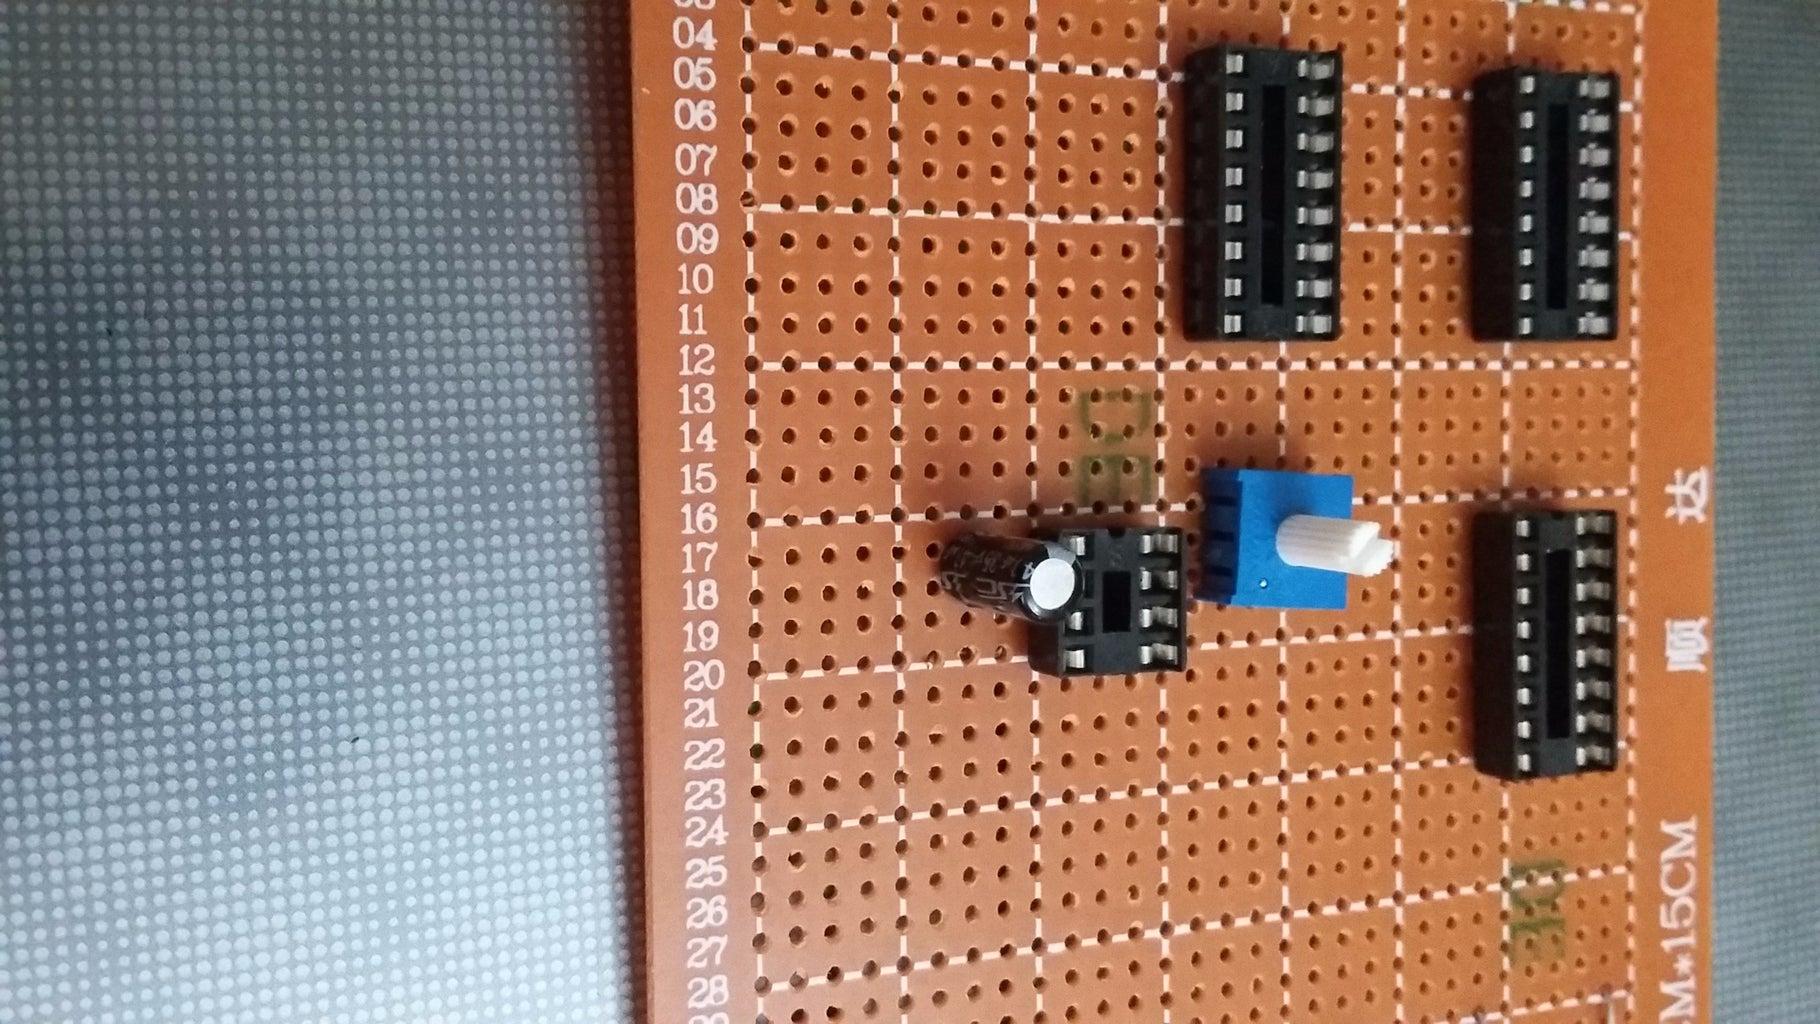 Install the 10K Potentiometer & Resistor